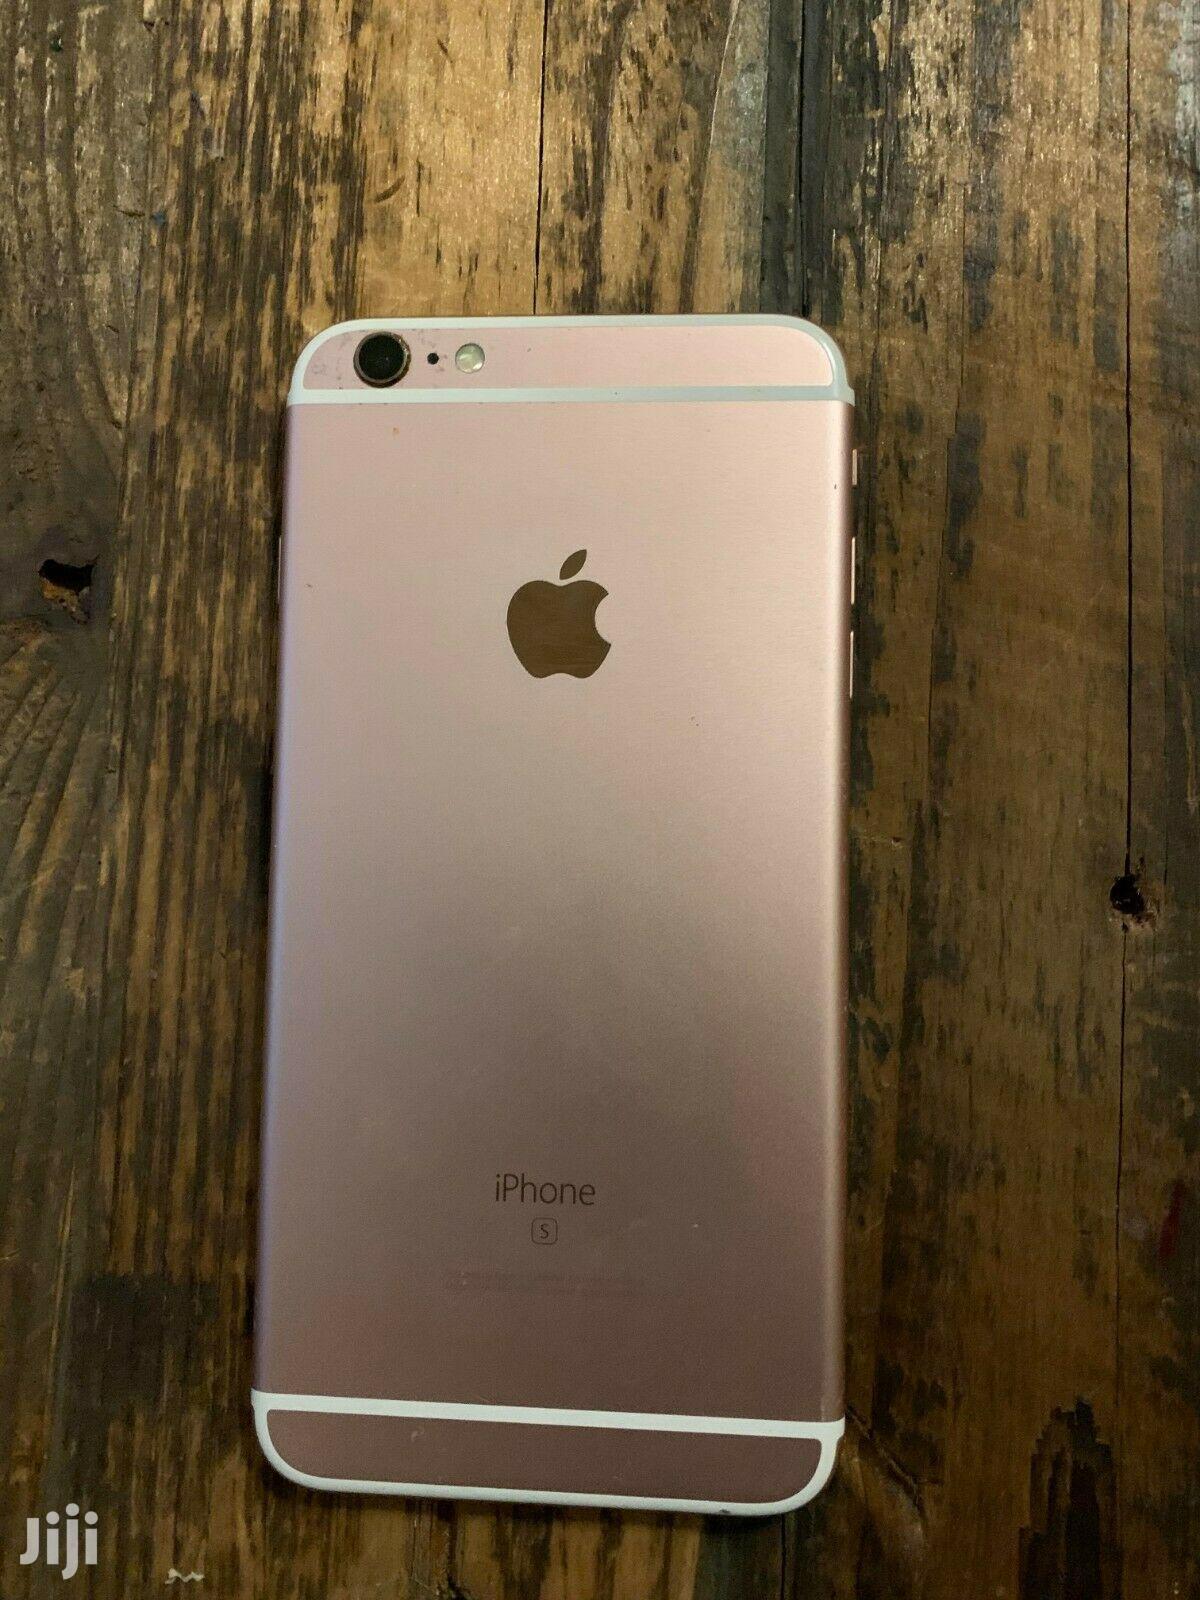 Archive: Apple iPhone 6s Plus 64 GB